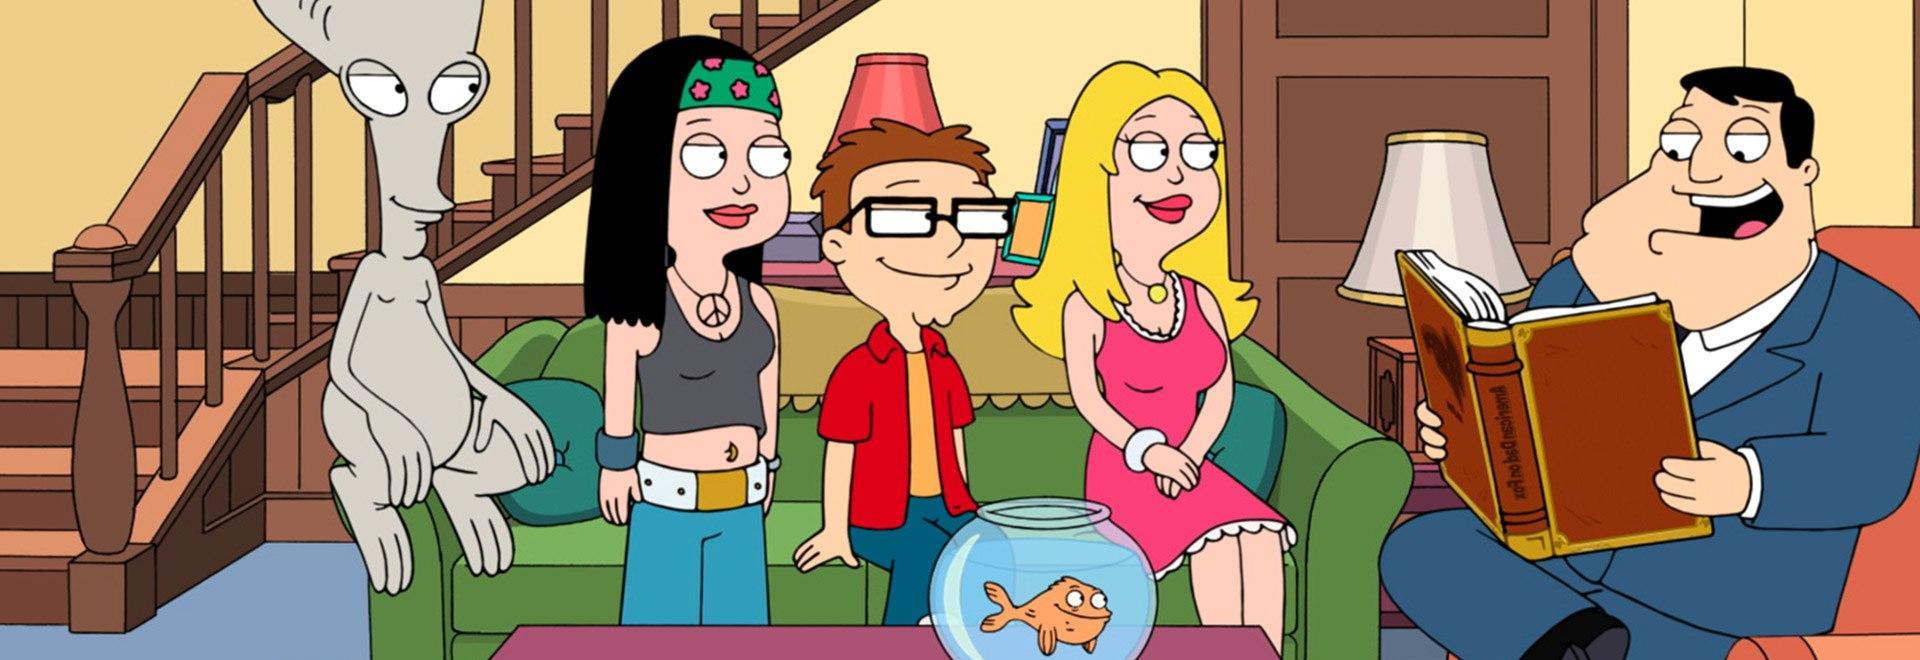 Stan torna al college